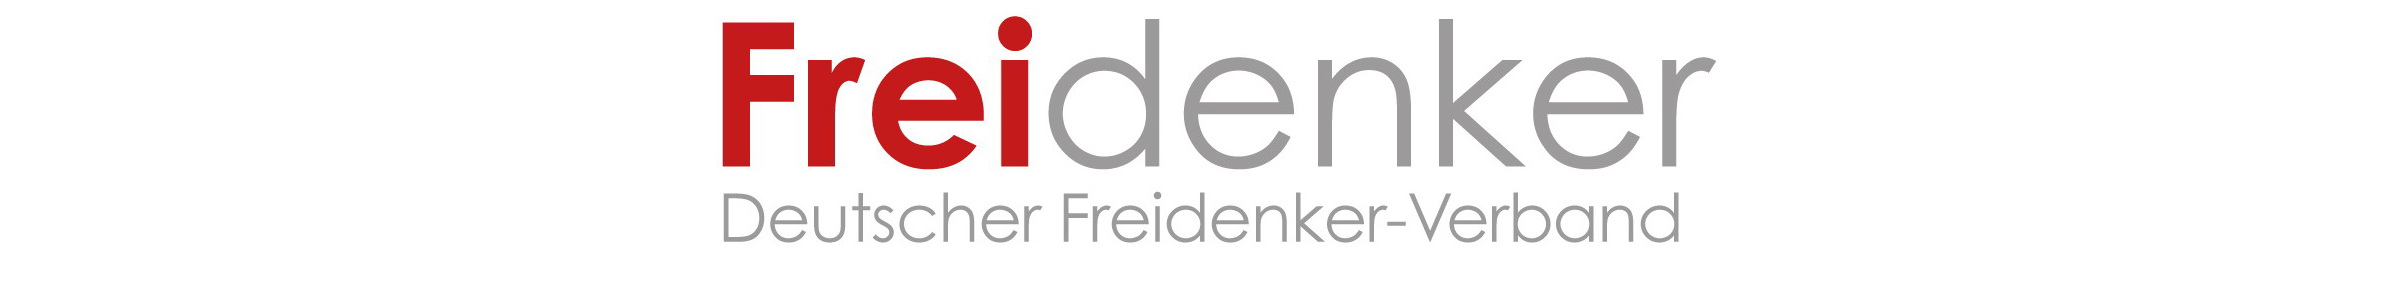 Deutscher Freidenker-Verband e.V.